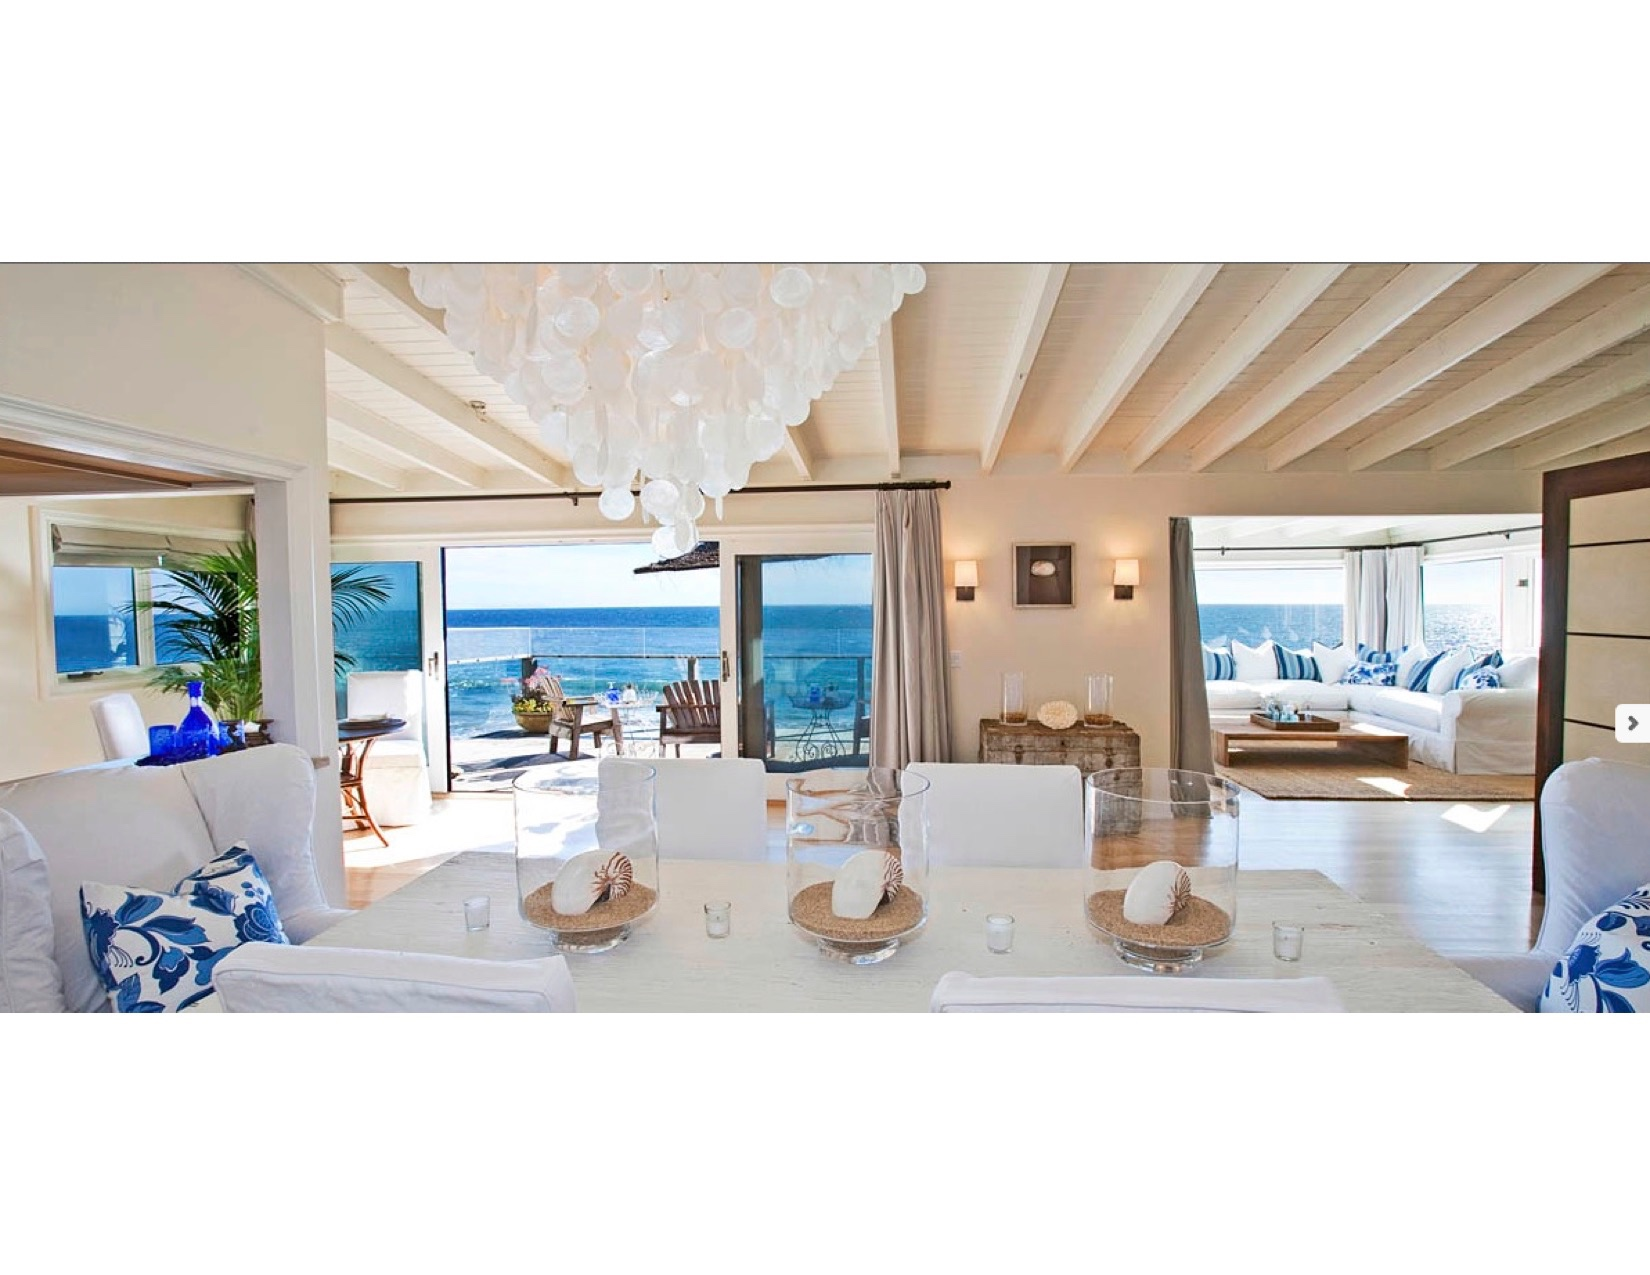 MALIBU BEACHOUE DINING ROOM copy.jpg